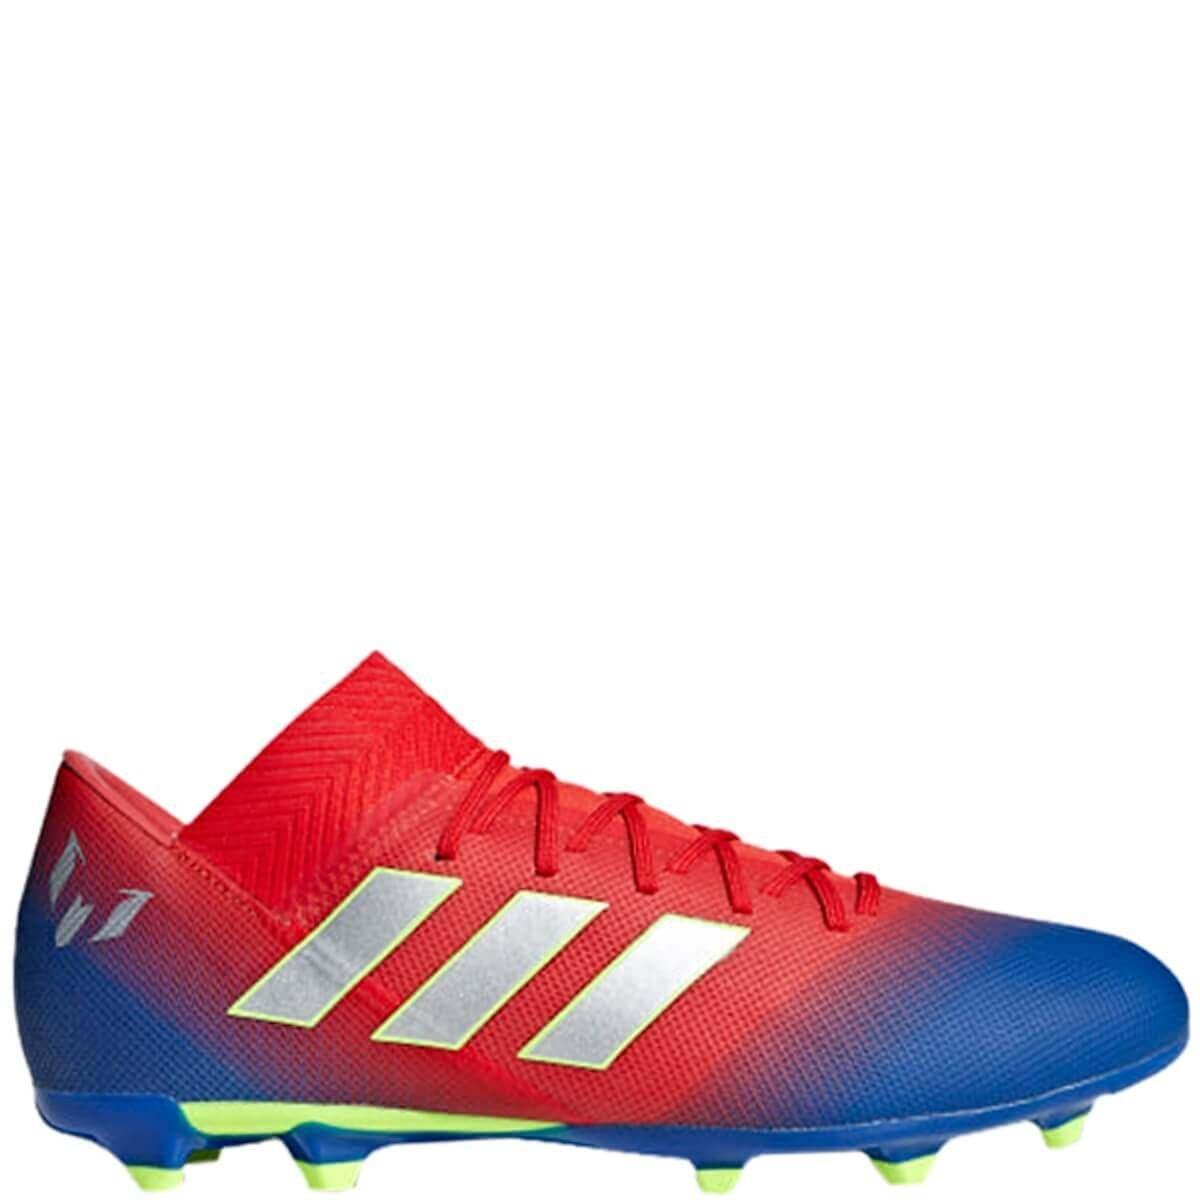 ec8ecca8bd47f Chuteira Adidas Nemeziz Messi 18.3